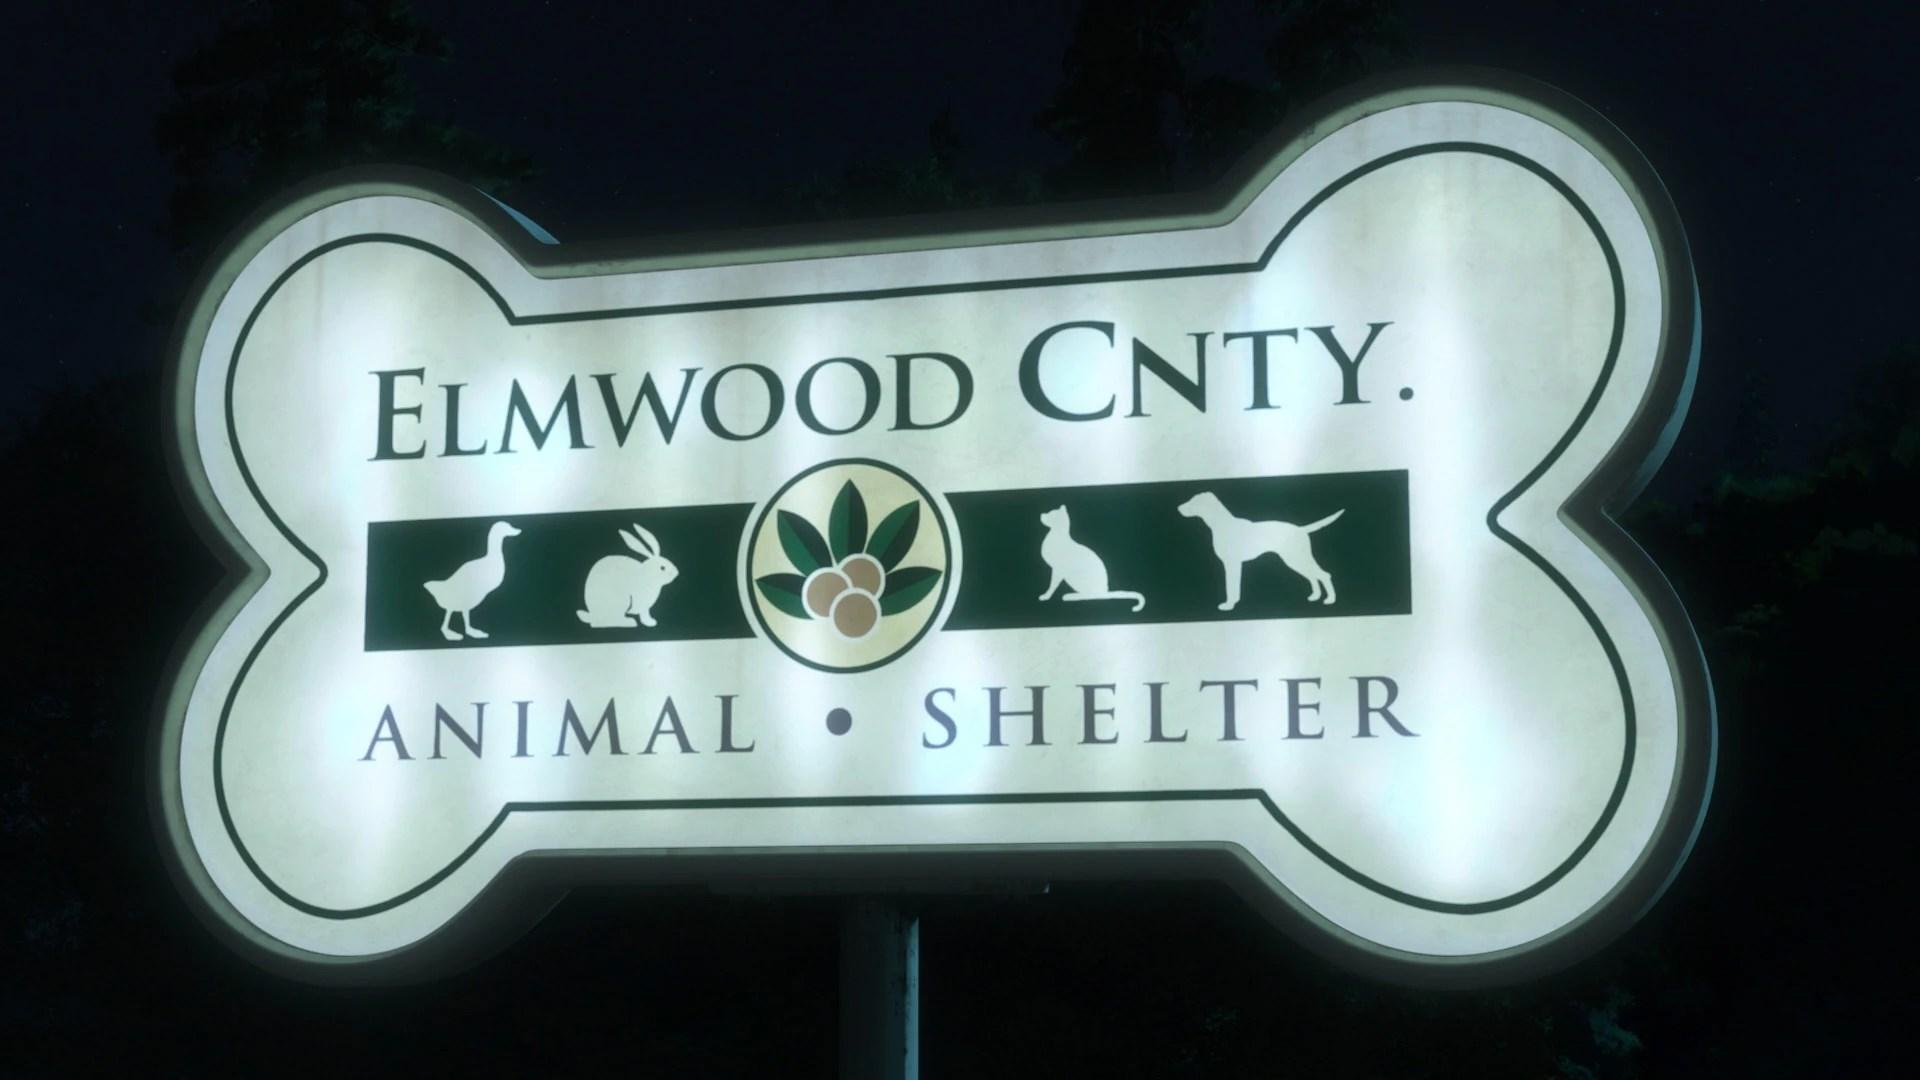 Elmwood County Animal Shelter Disney Wiki Fandom